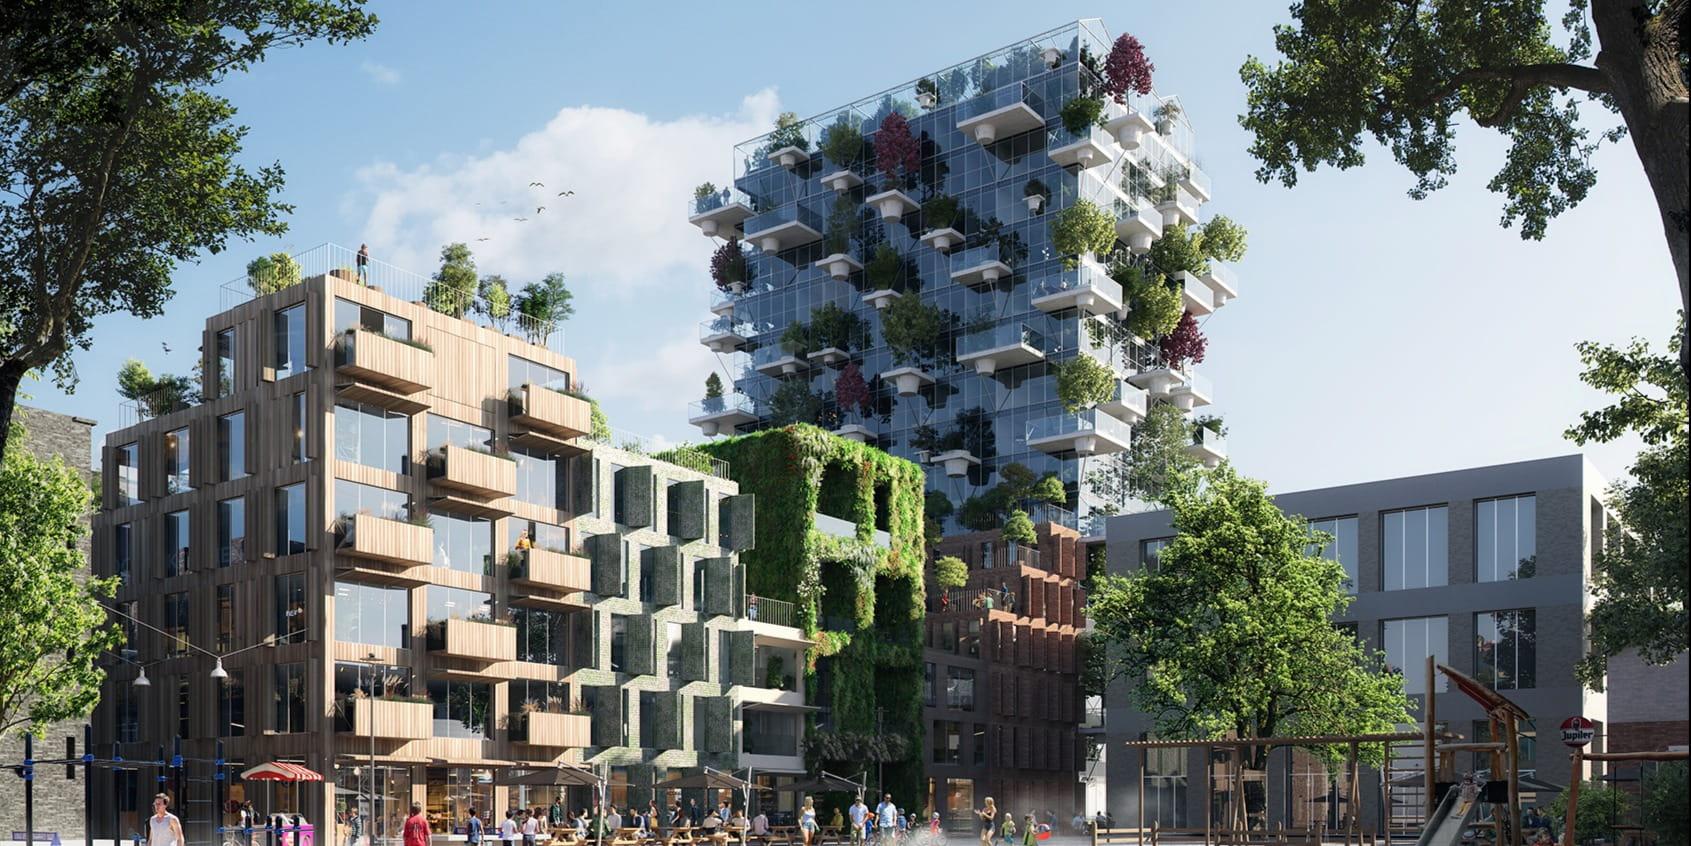 MVRDV creates new green block of seven sustainable residential buildings on Amsterdam's Oostenburg Island